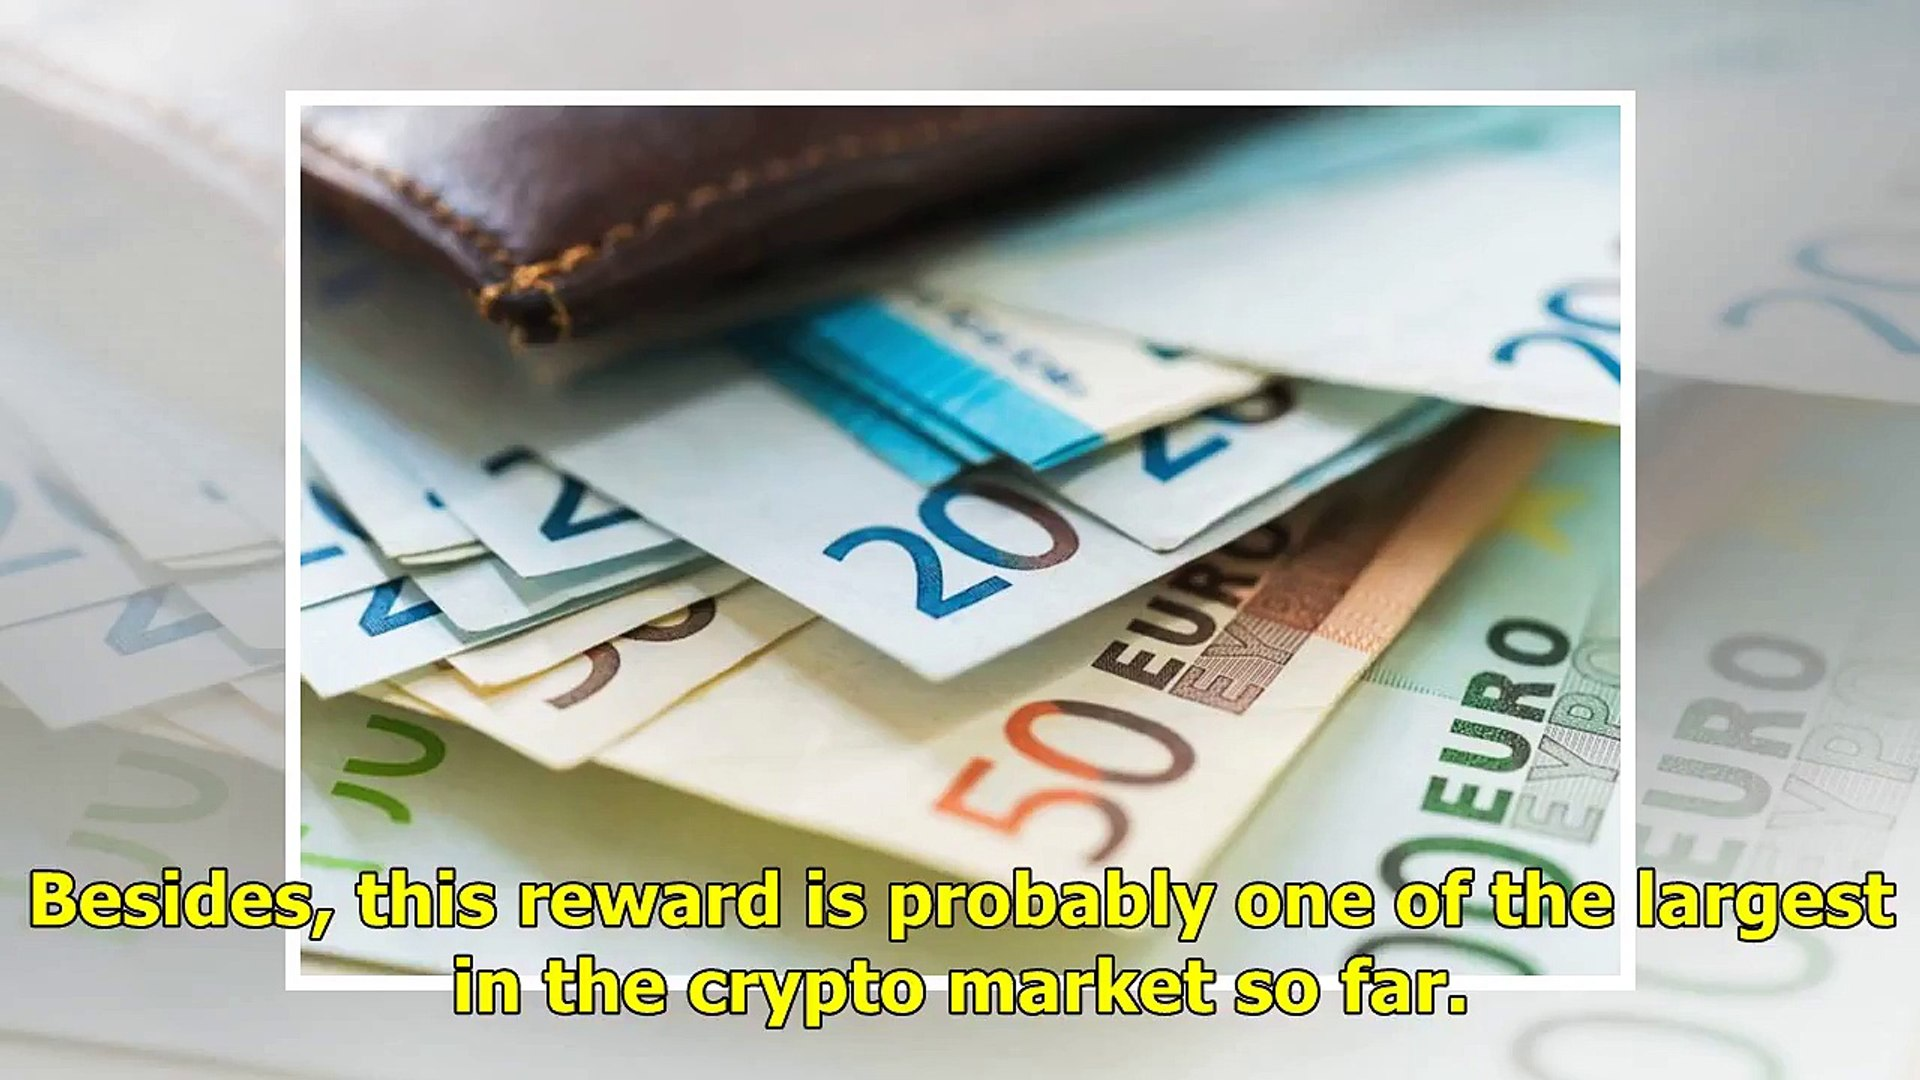 Tron (TRX) – A $2 billion reward pool and many more interesting news